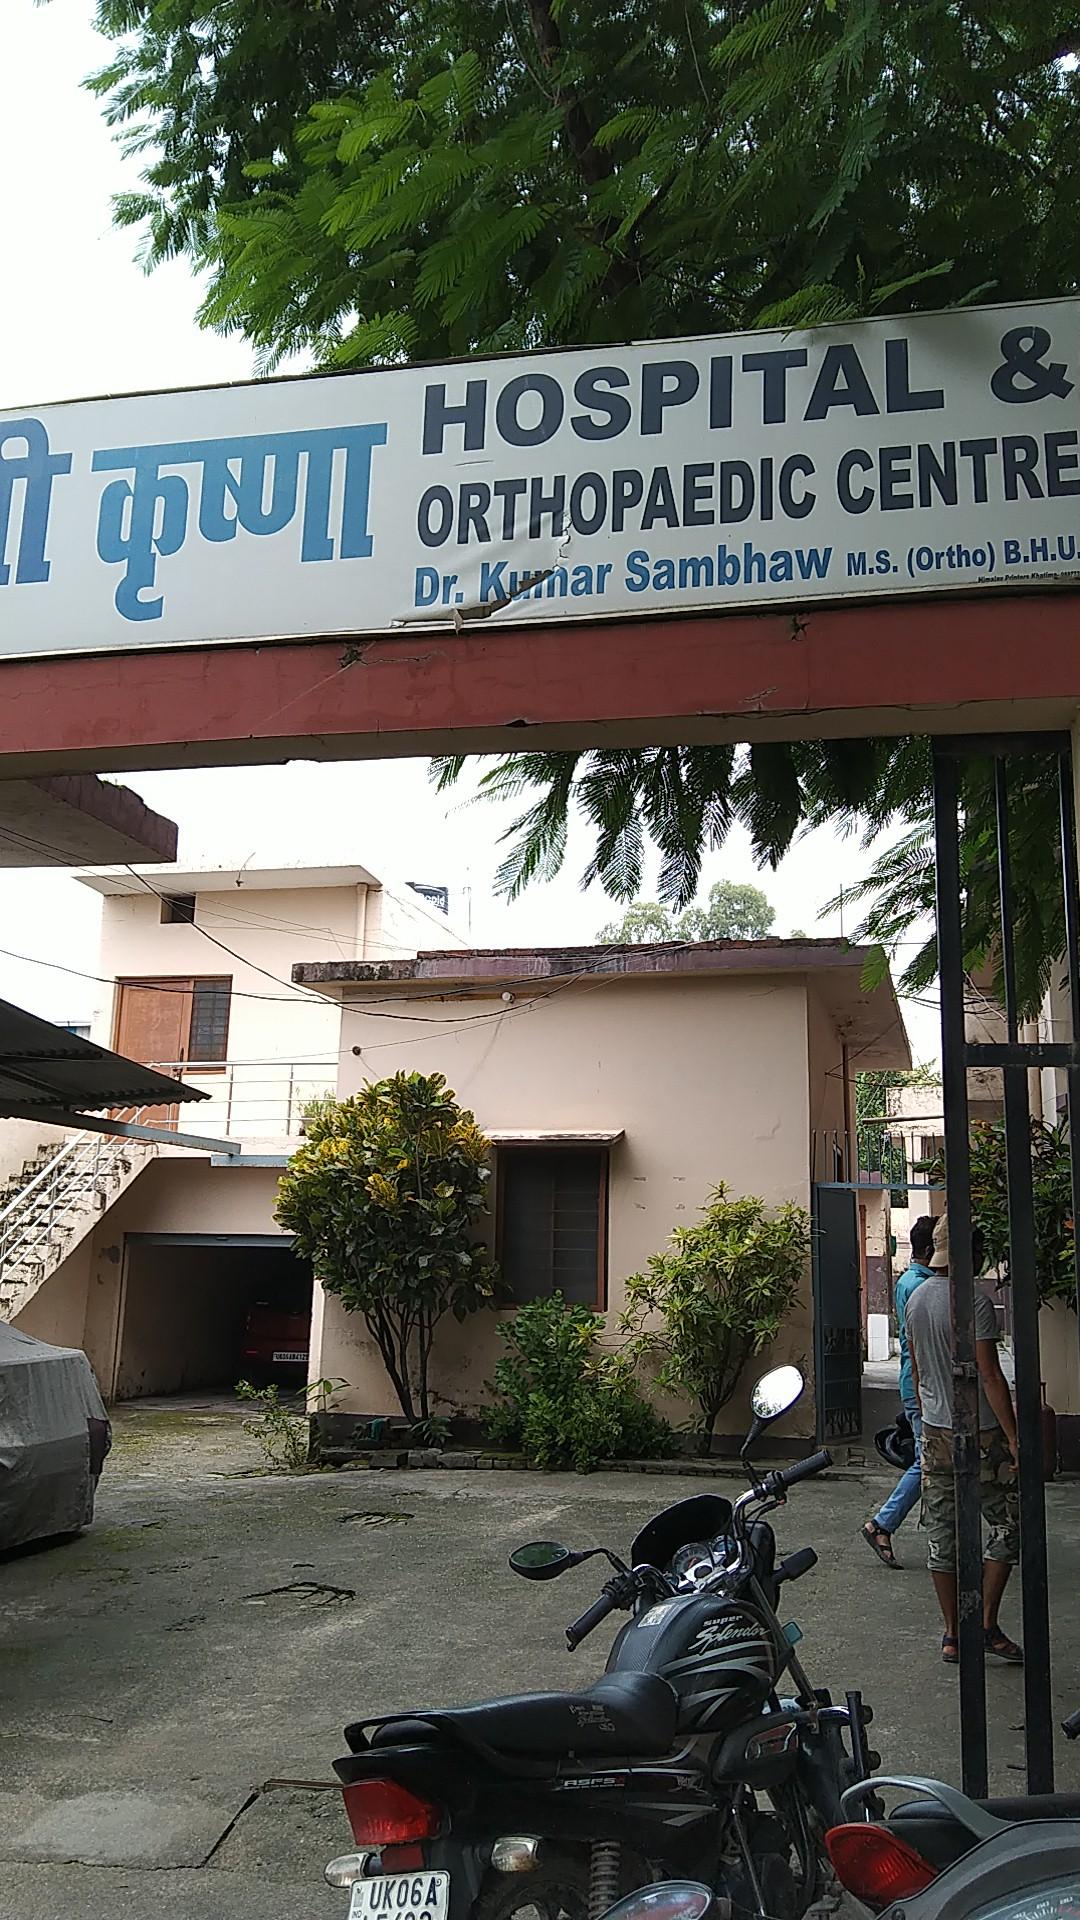 Shree Krishna Hospital & Orthopaedic Centre